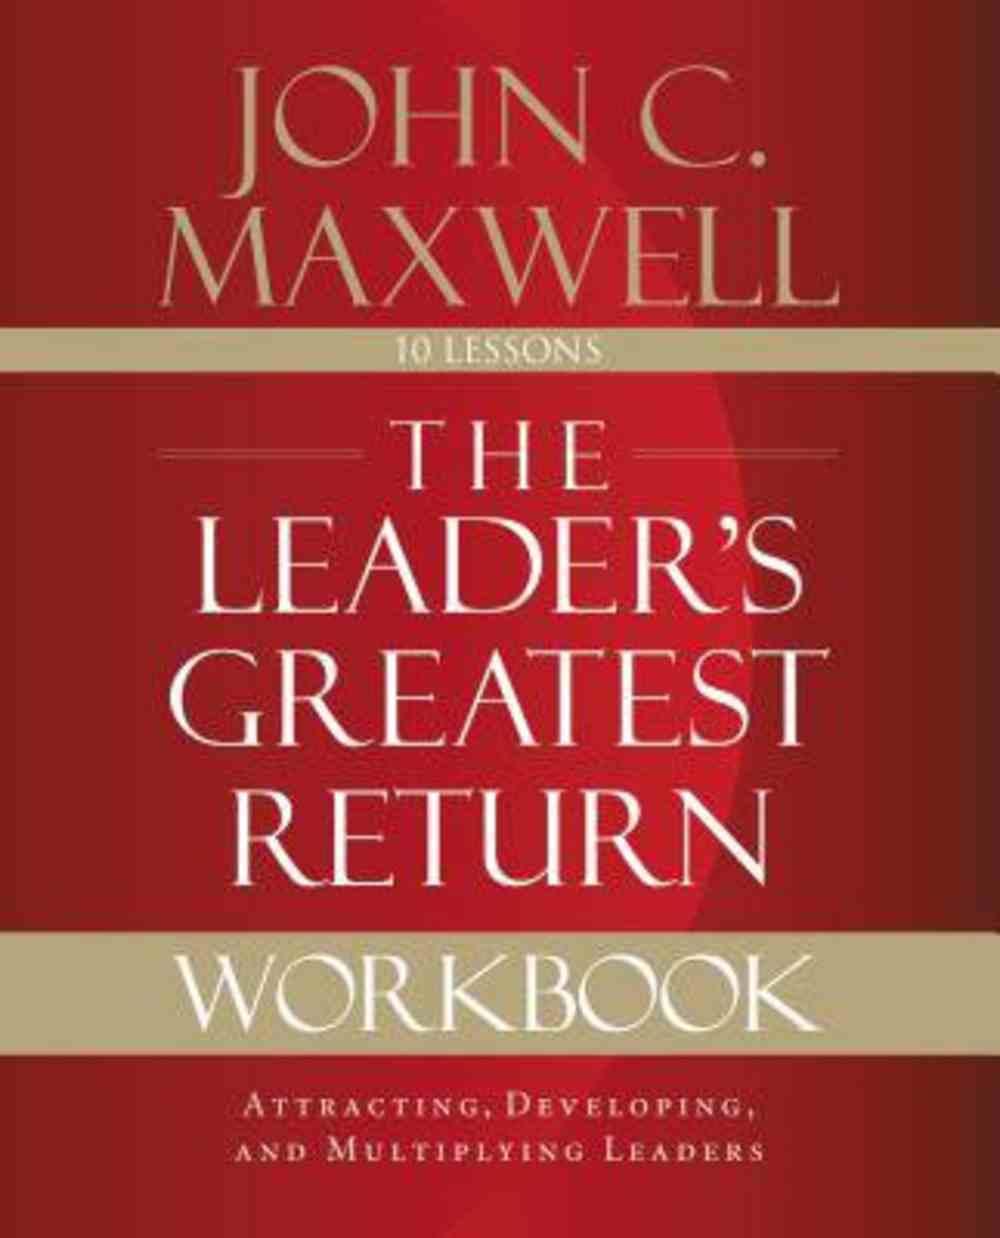 The Leader's Greatest Return Workbook eBook